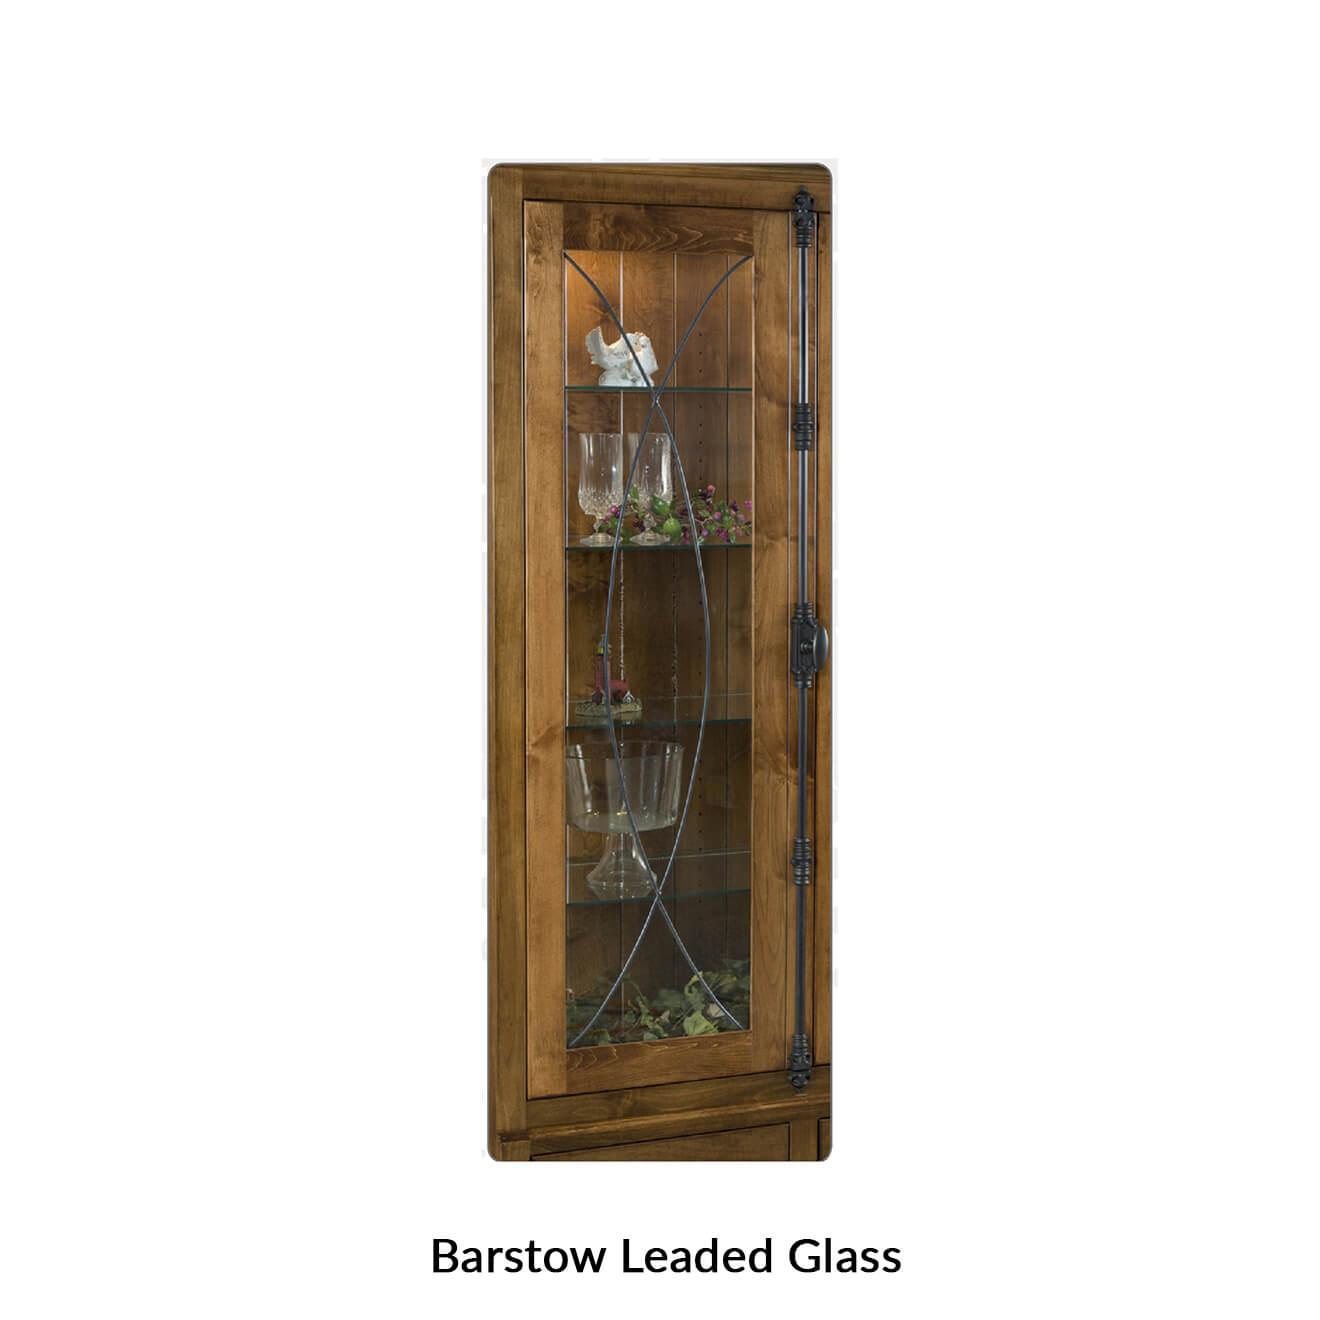 3-tf-barstow-leaded-glass.jpg